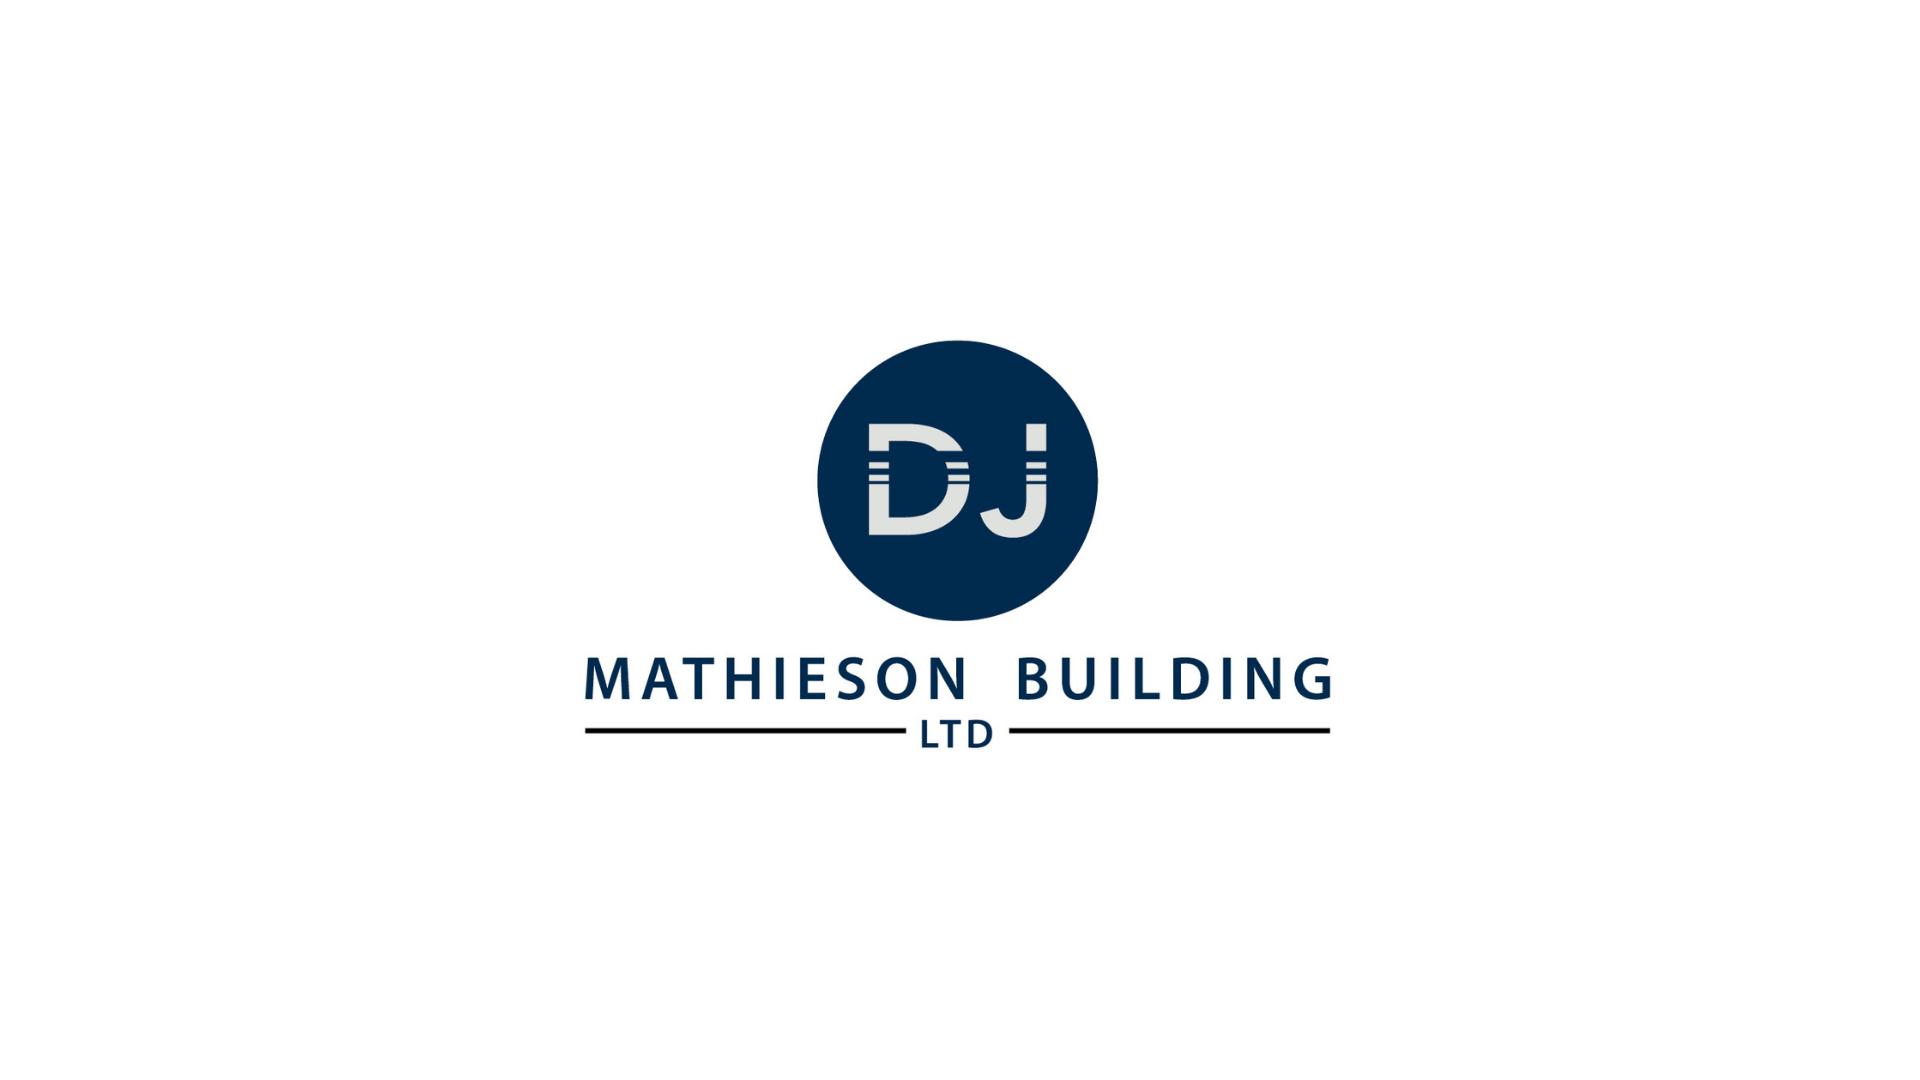 DJ Mathieson